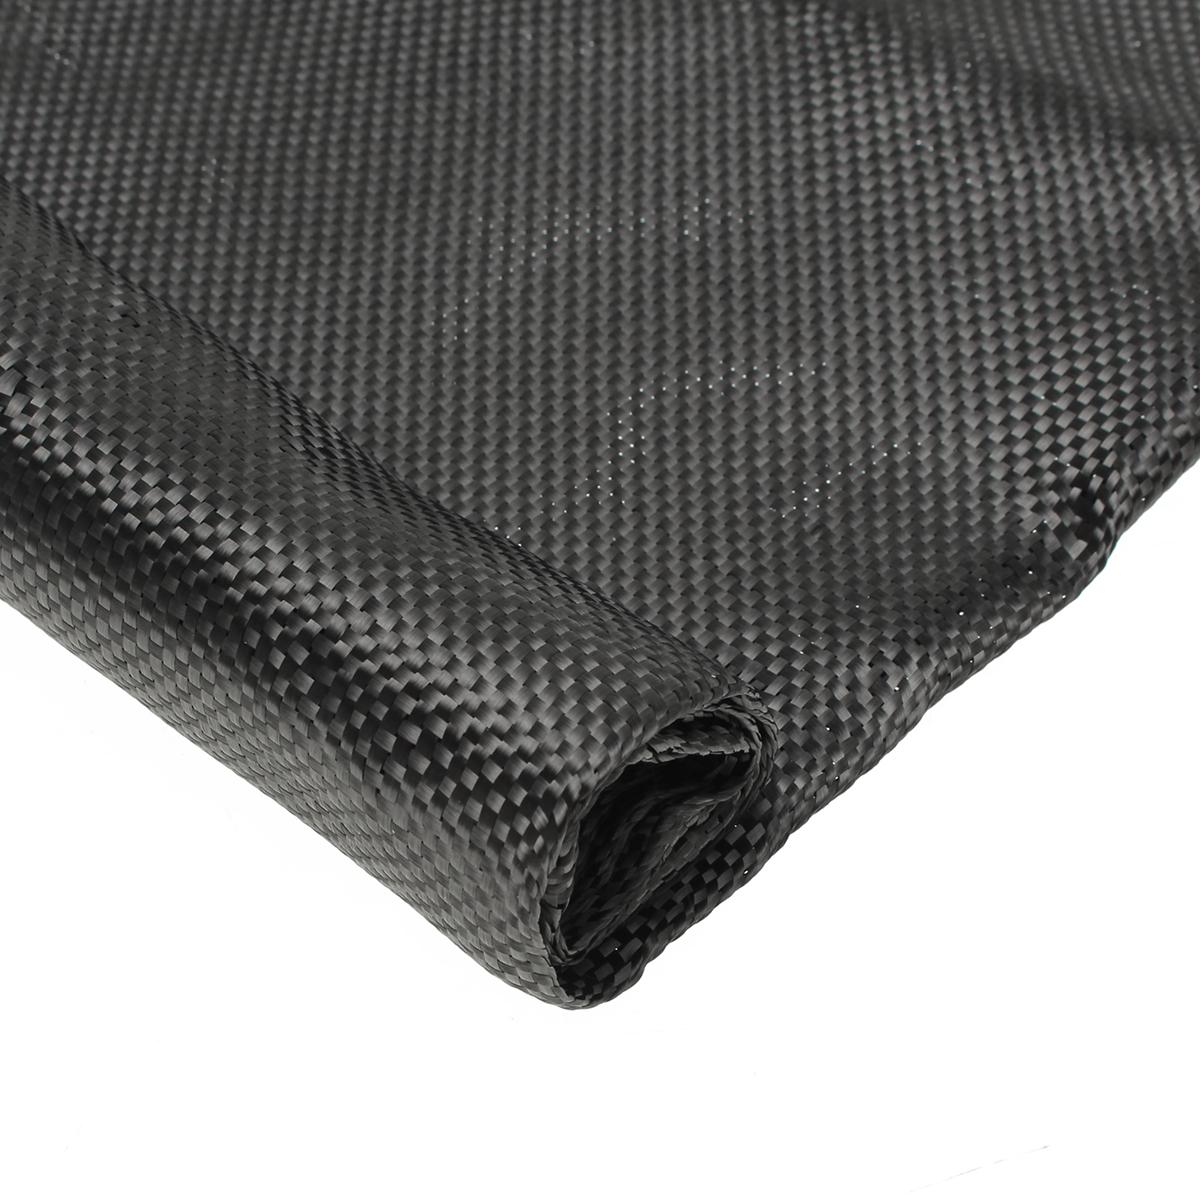 3K 200gsm 8/'/'x60/'/' 150cm L Real Plain Twill Weave Carbon Fiber Cloth Fabric  A